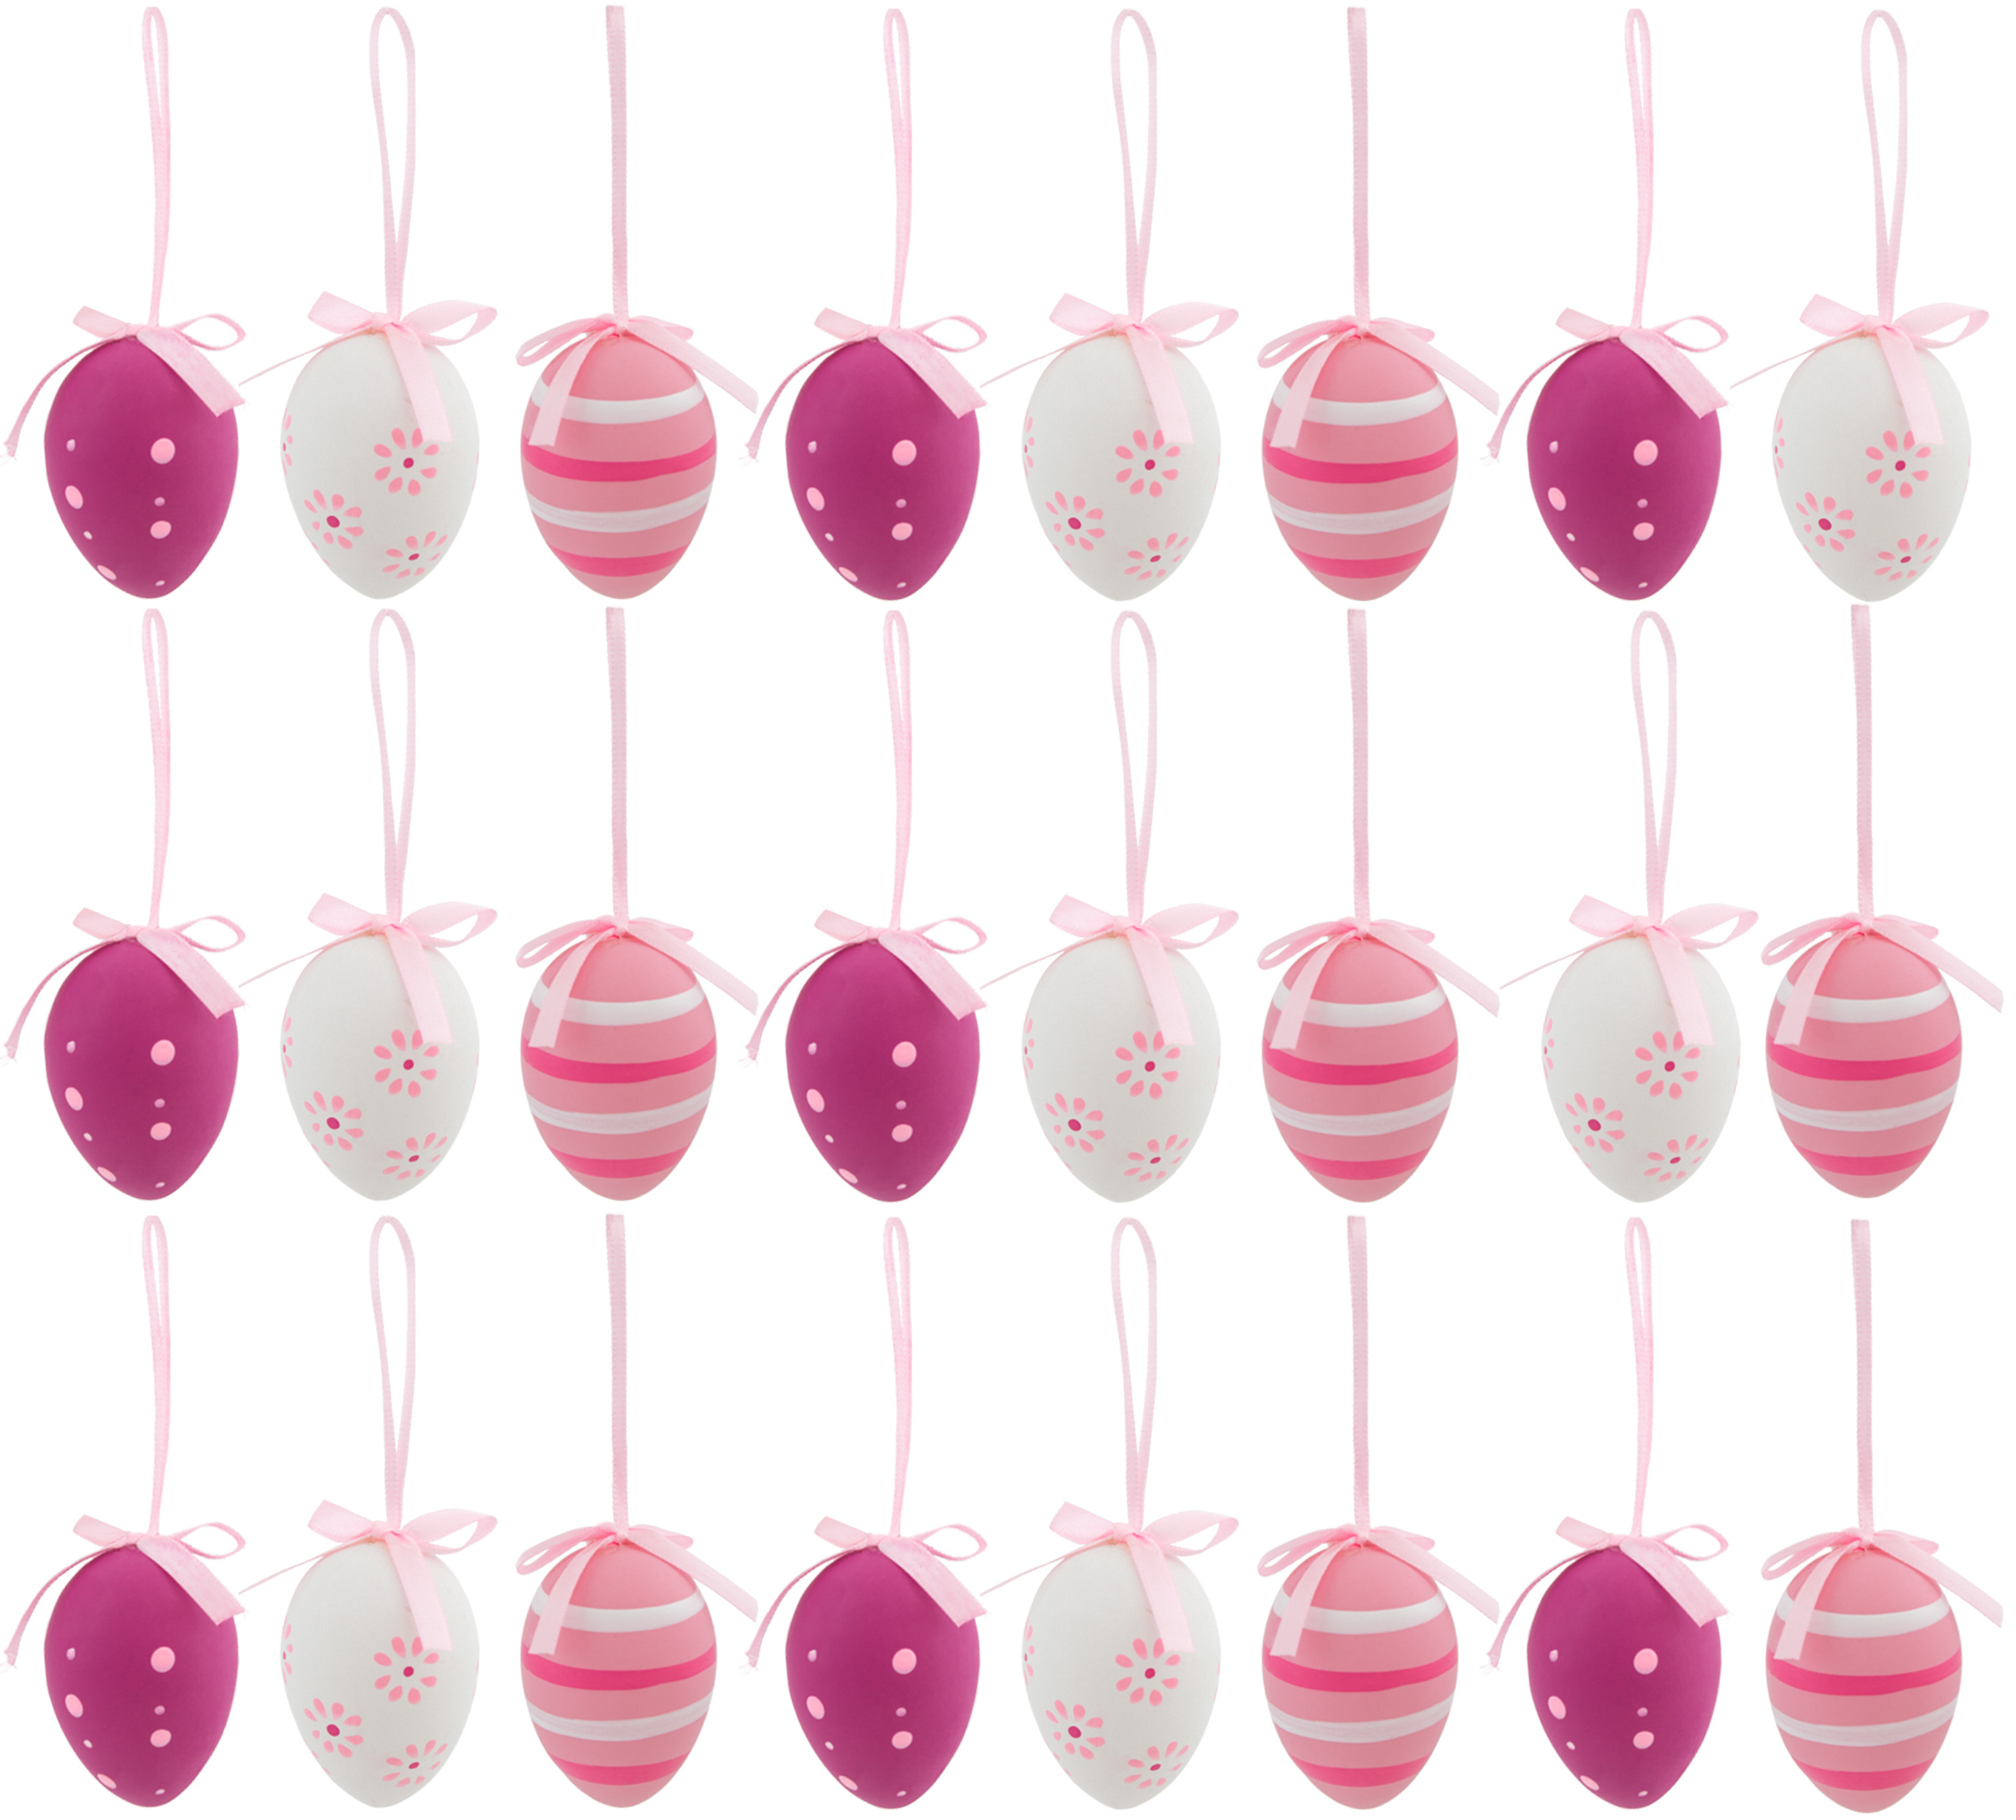 brubaker ostereier dekoration zum aufh ngen im 24er set rosa weiss sonstige dekoration. Black Bedroom Furniture Sets. Home Design Ideas